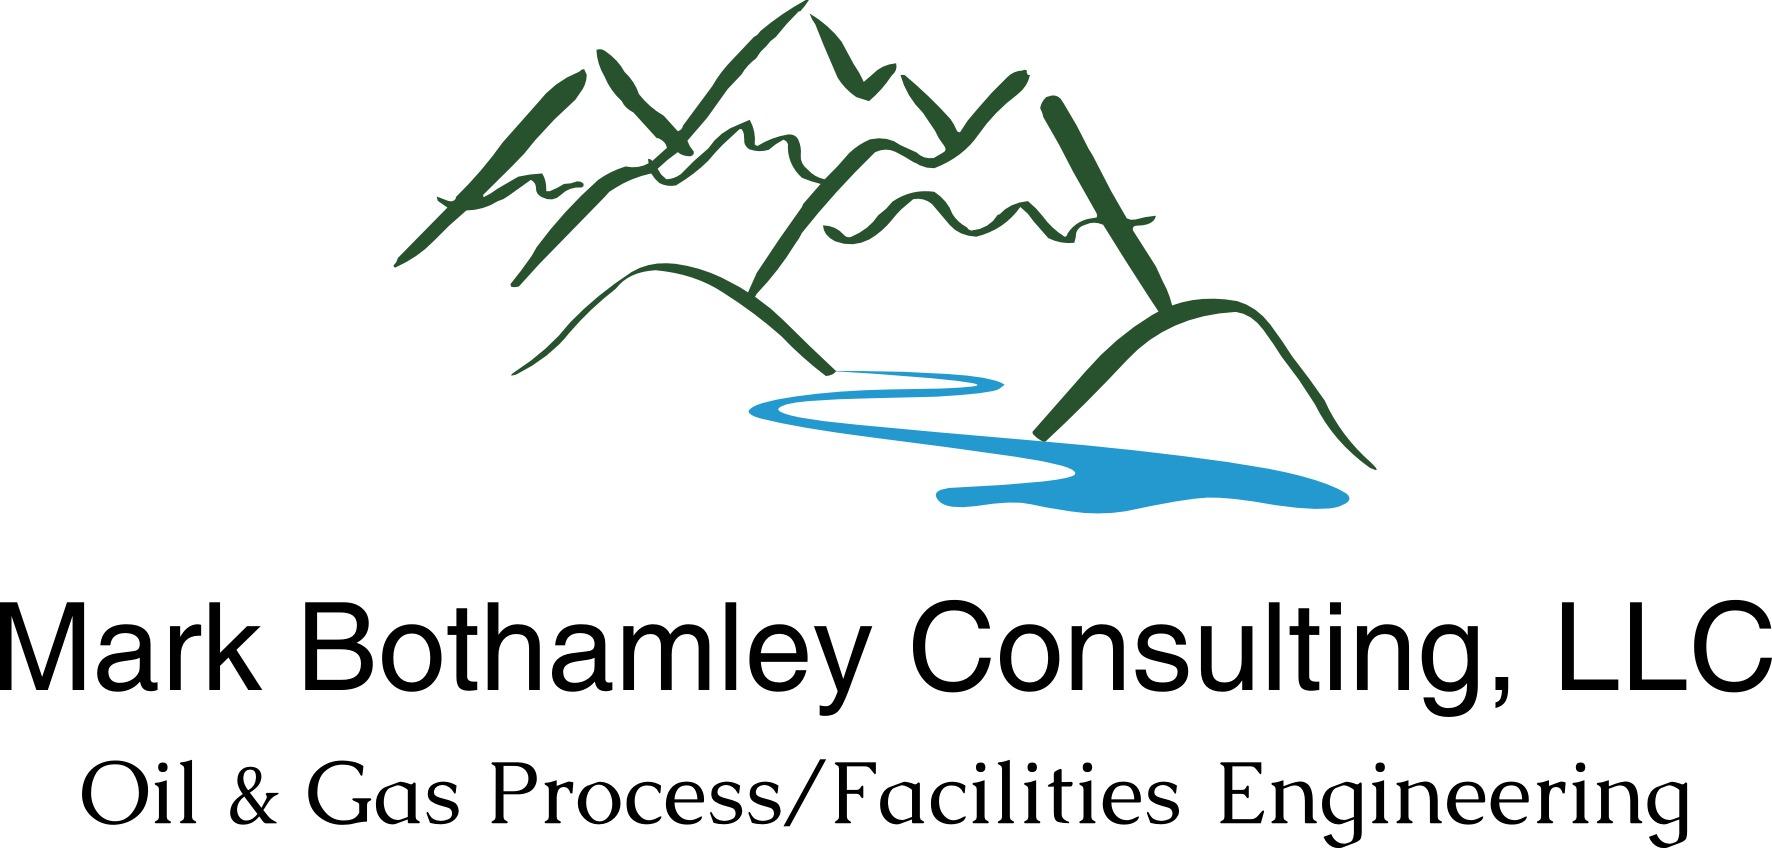 Resume | Mark Bothamley Consulting, LLC